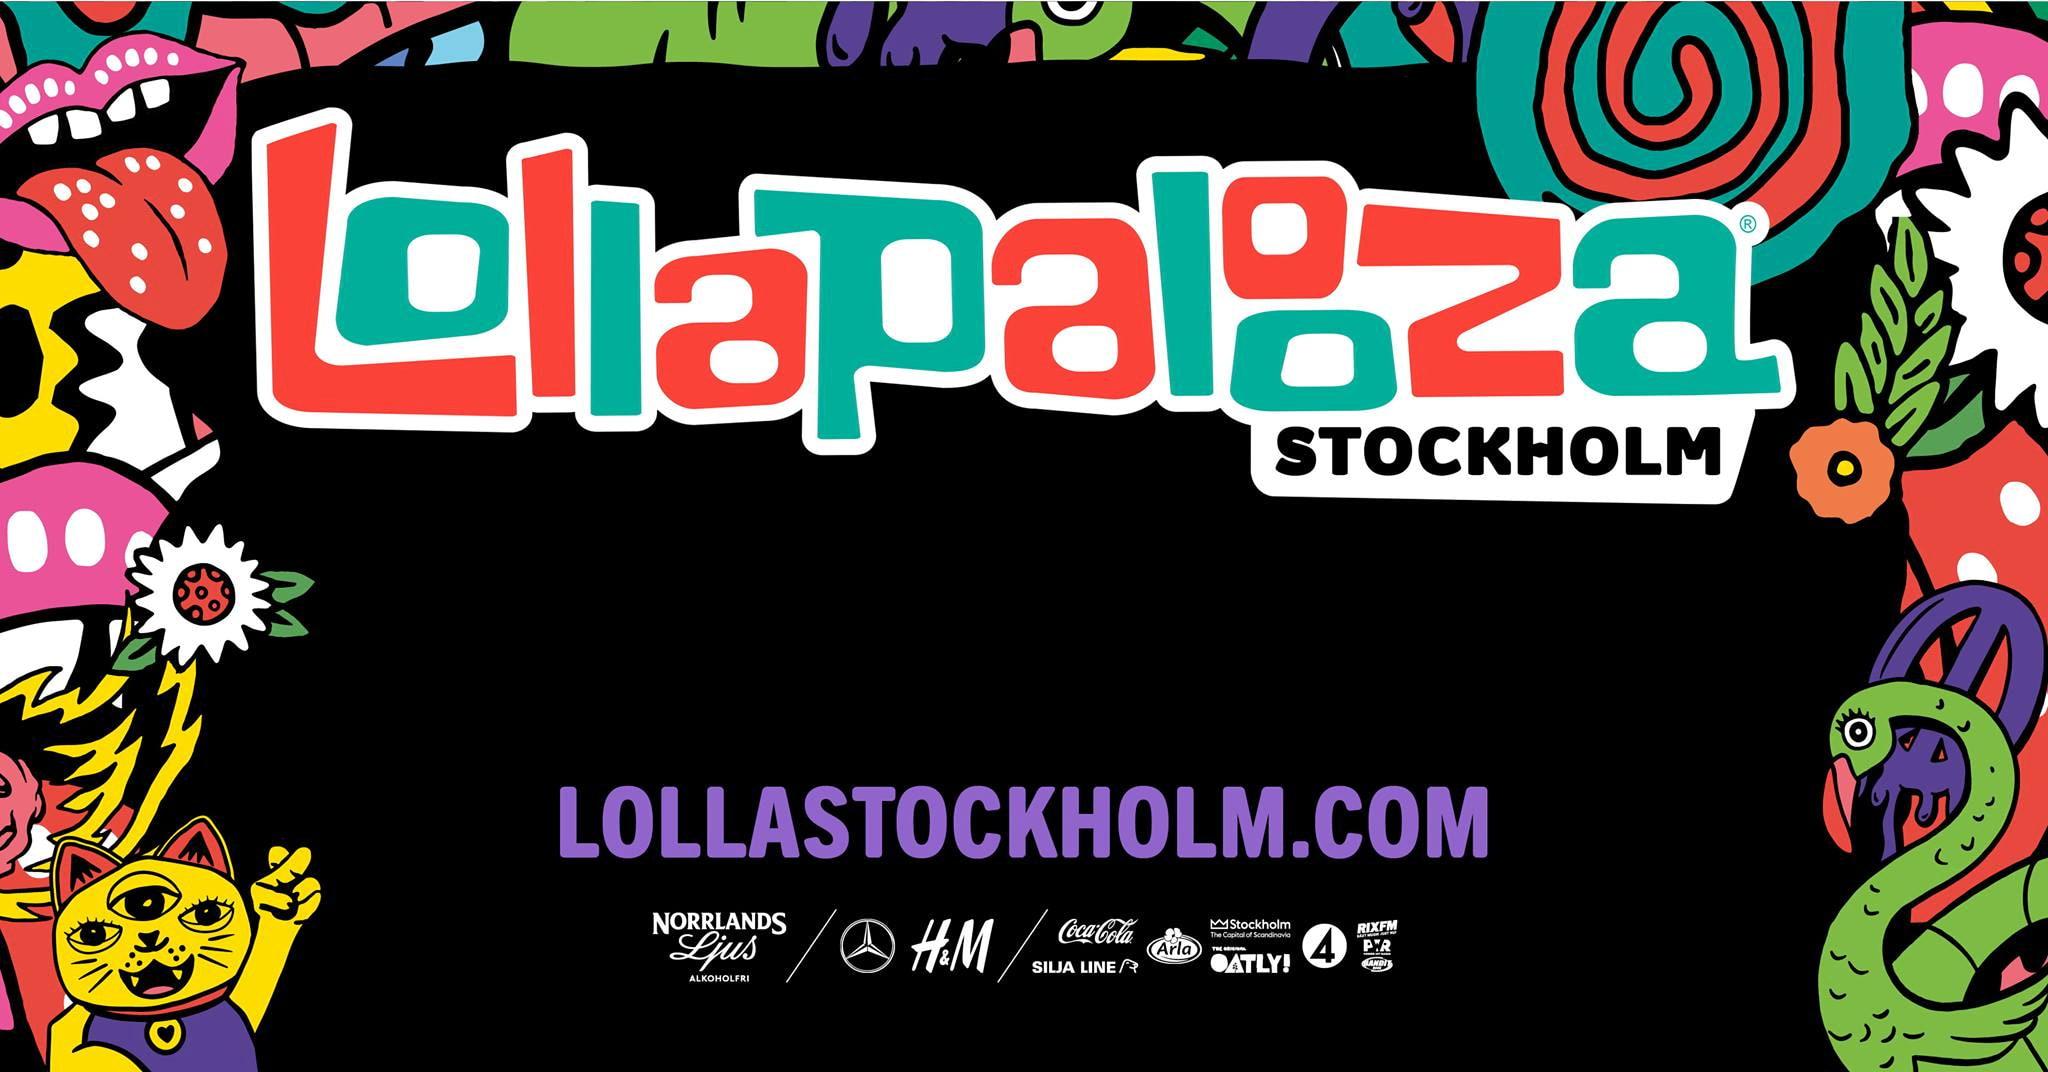 Bild: Lollapalooza